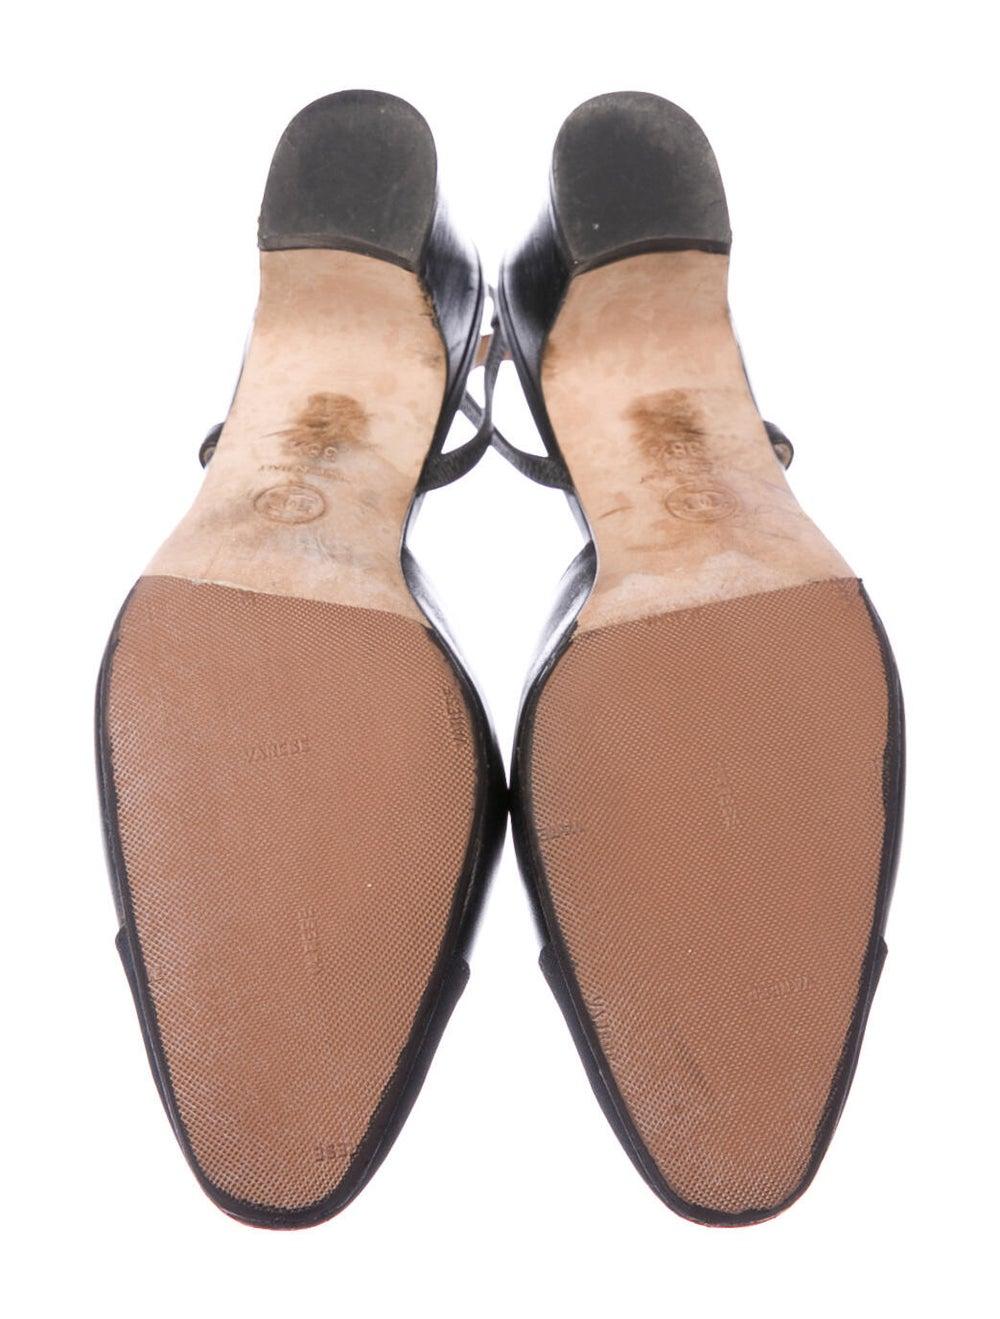 Chanel CC Cap-Toe Slingback Pumps Leather Slingba… - image 5